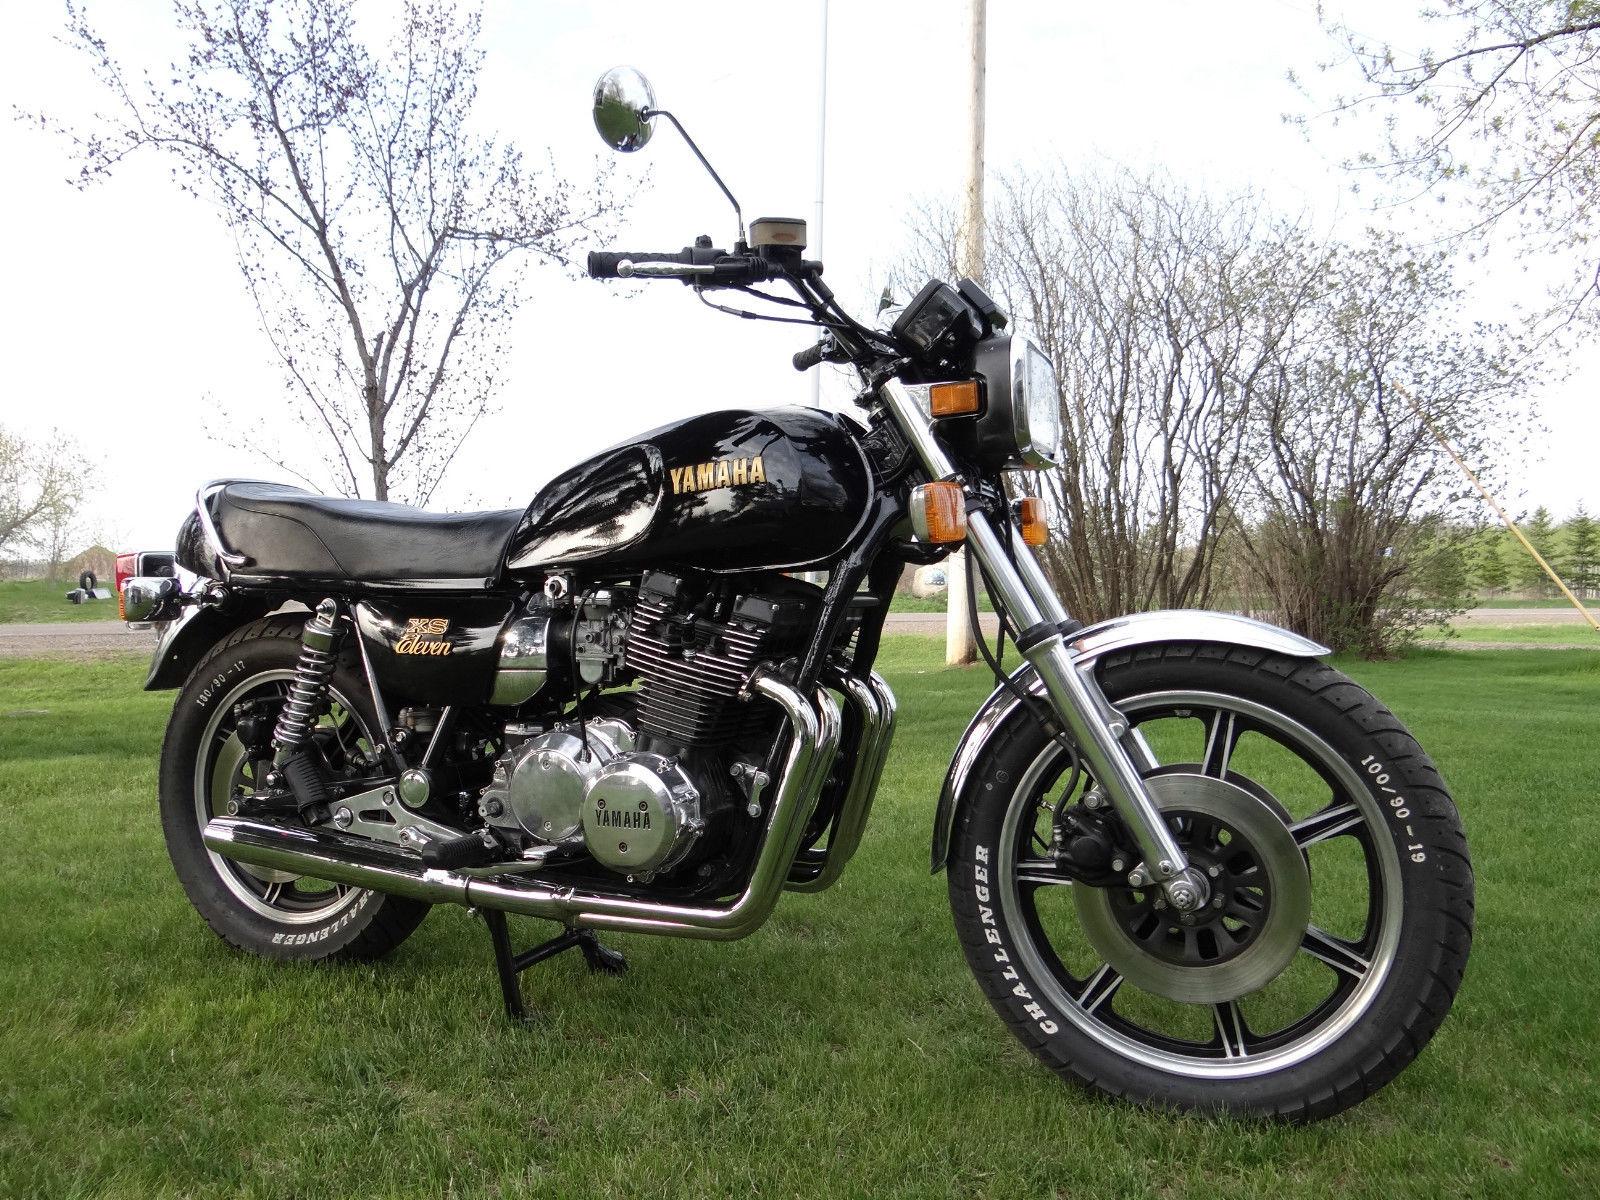 Yamaha XS1100 - 1978